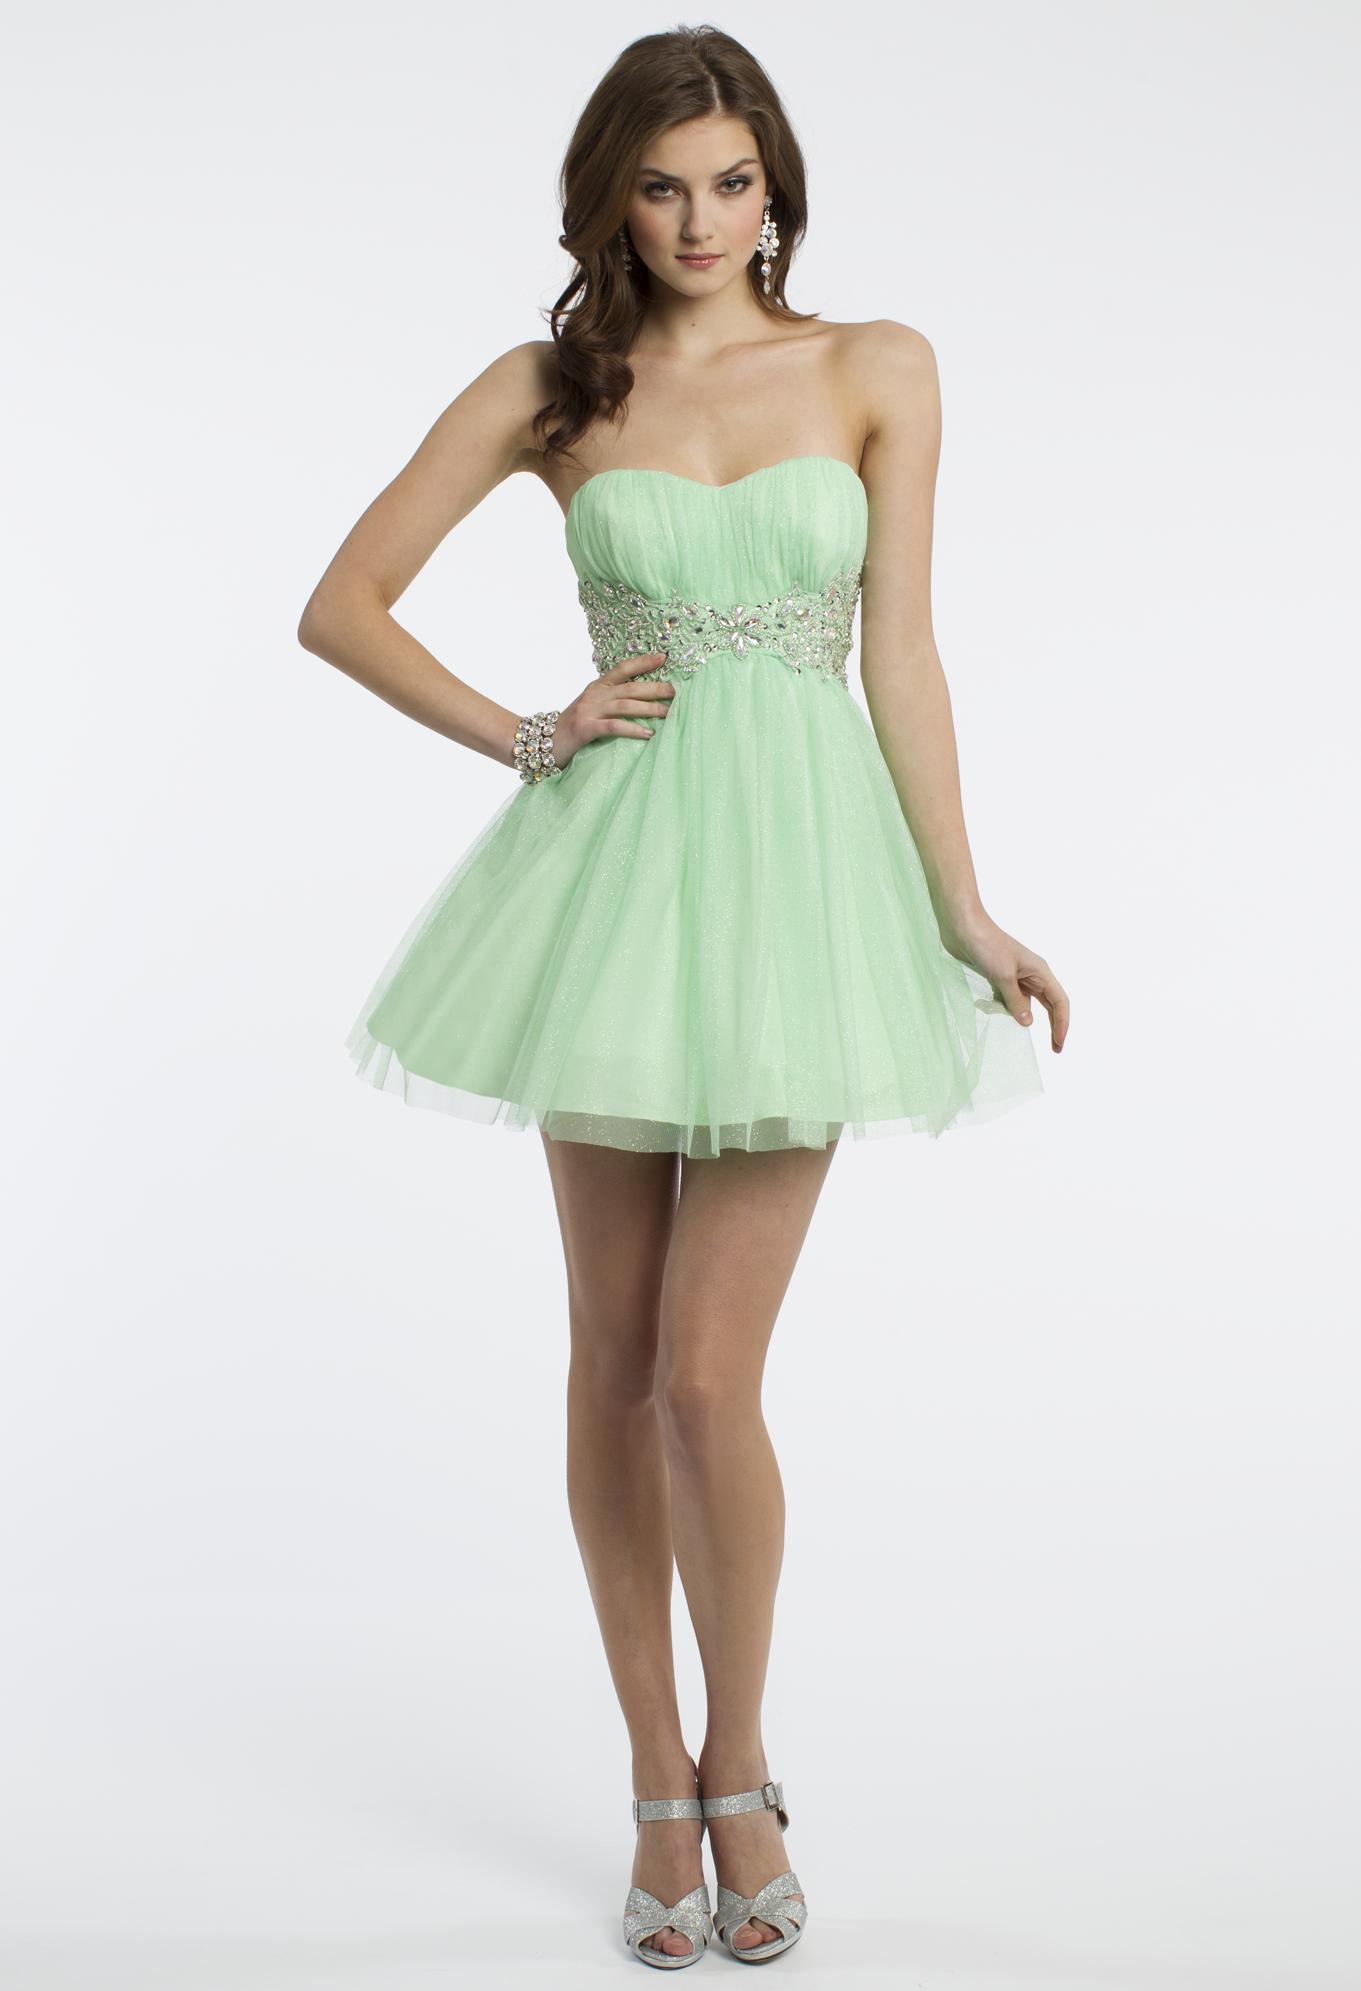 Camille La Vie Short and Strapless Glitter Prom Dress | PROM DRESSES ...